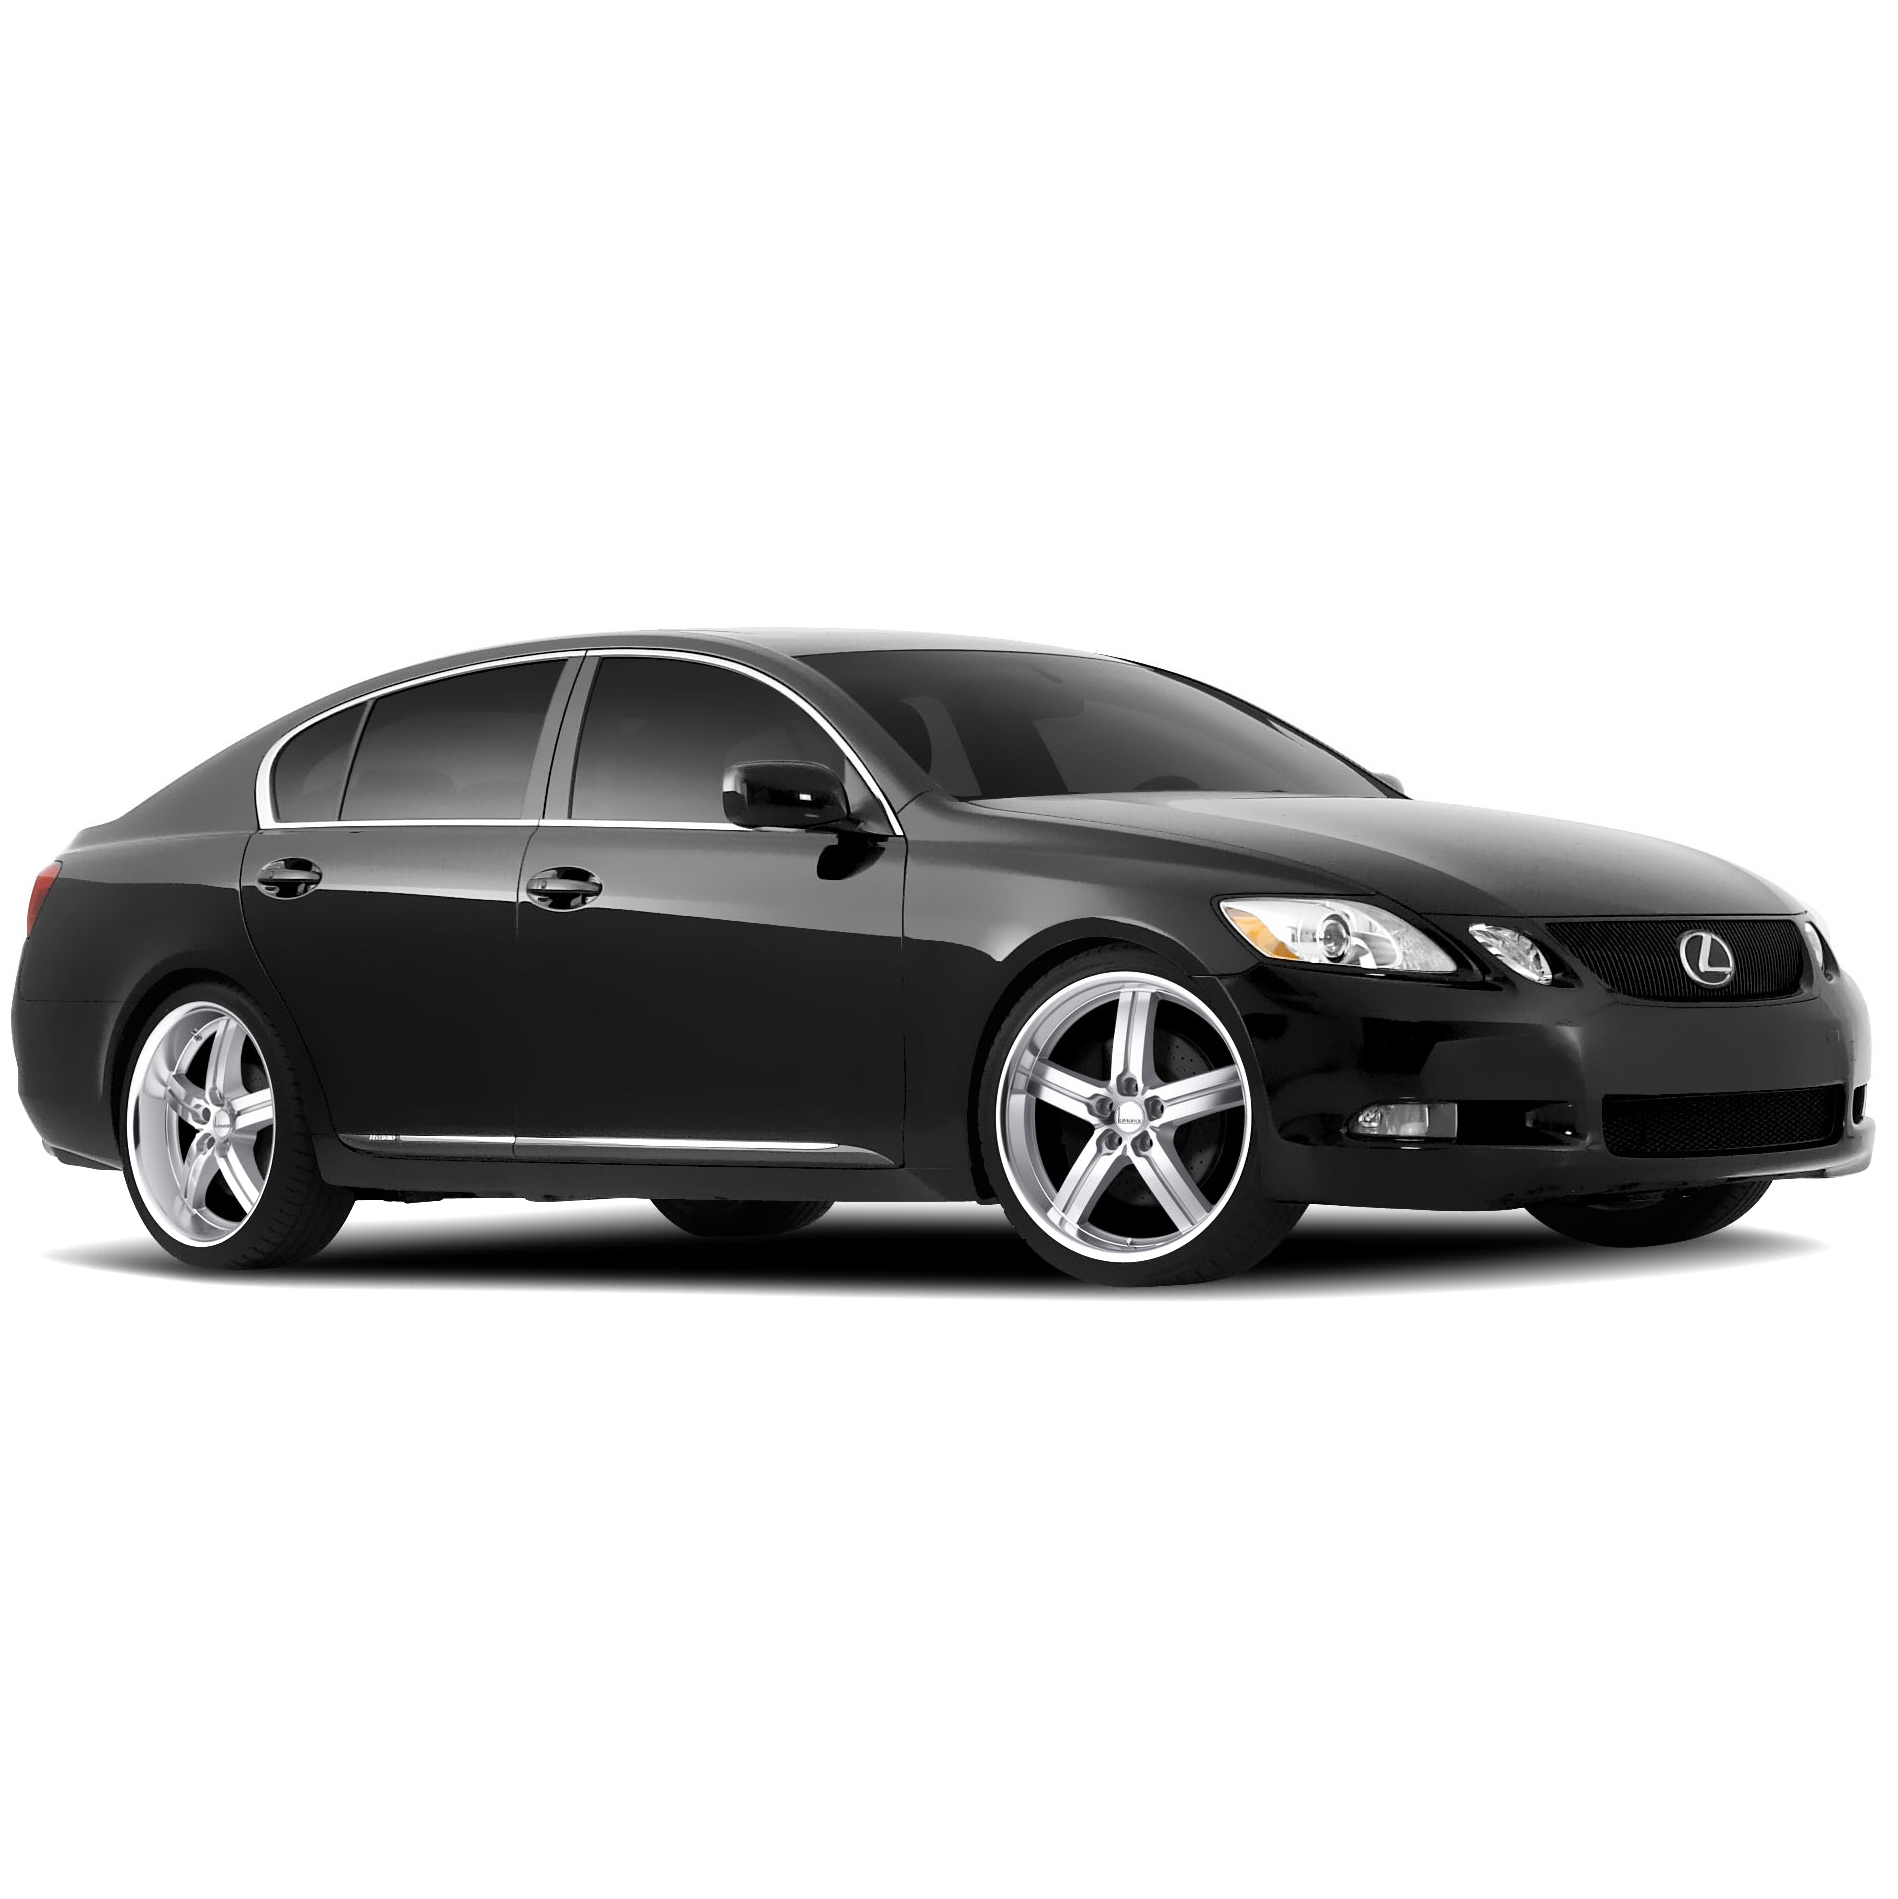 Lexus GS 450H (2005 - 2011)